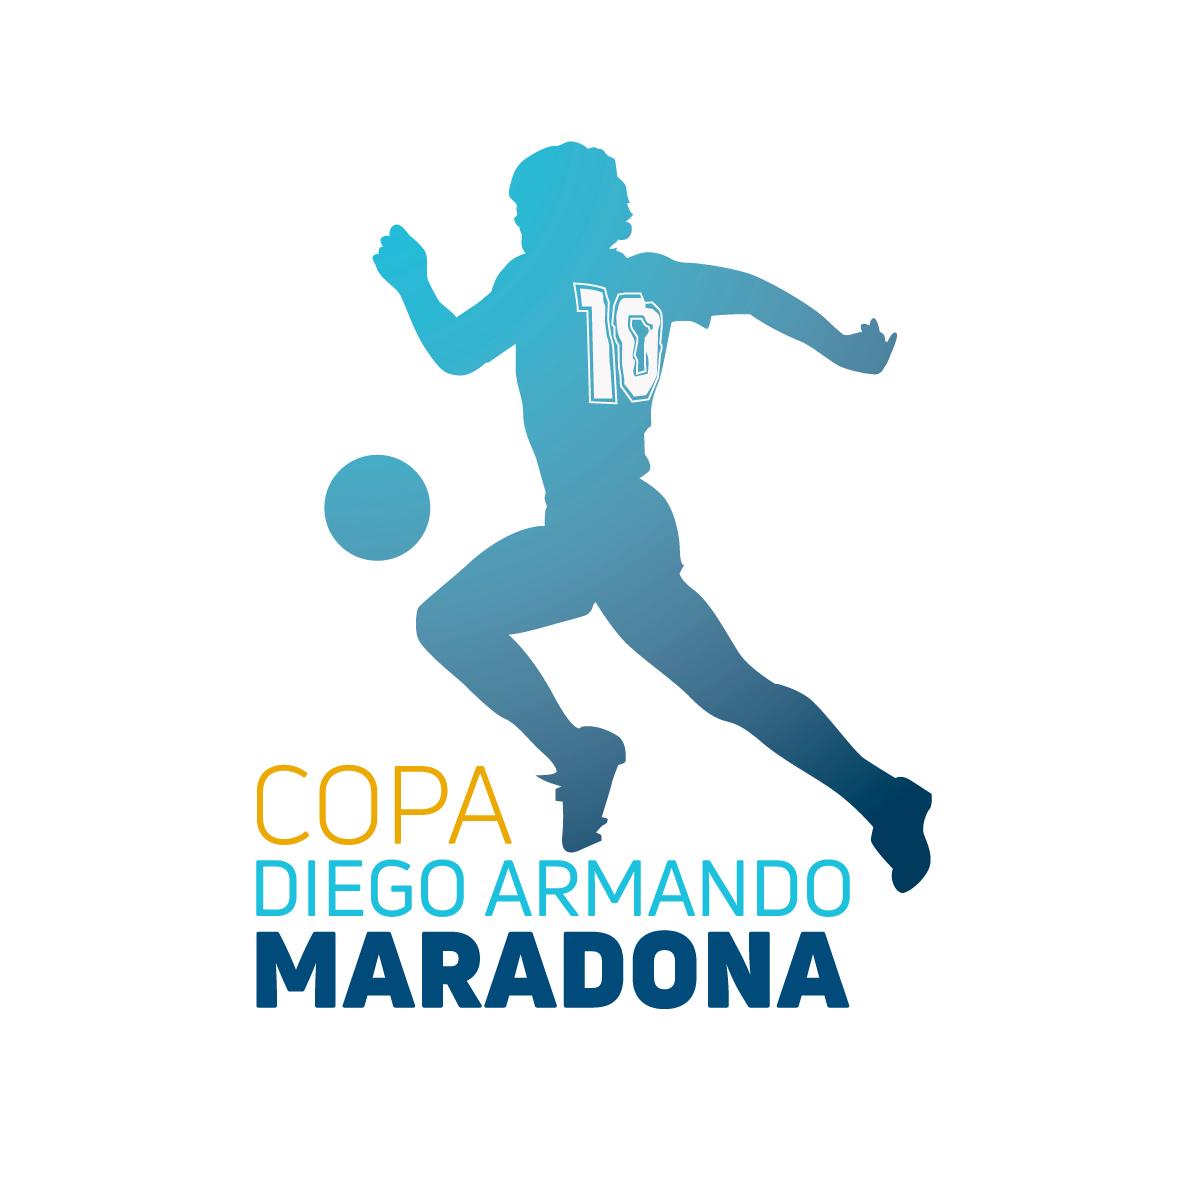 00-MARCA Copa Diego Maradona OUT_FONDO BLANCO